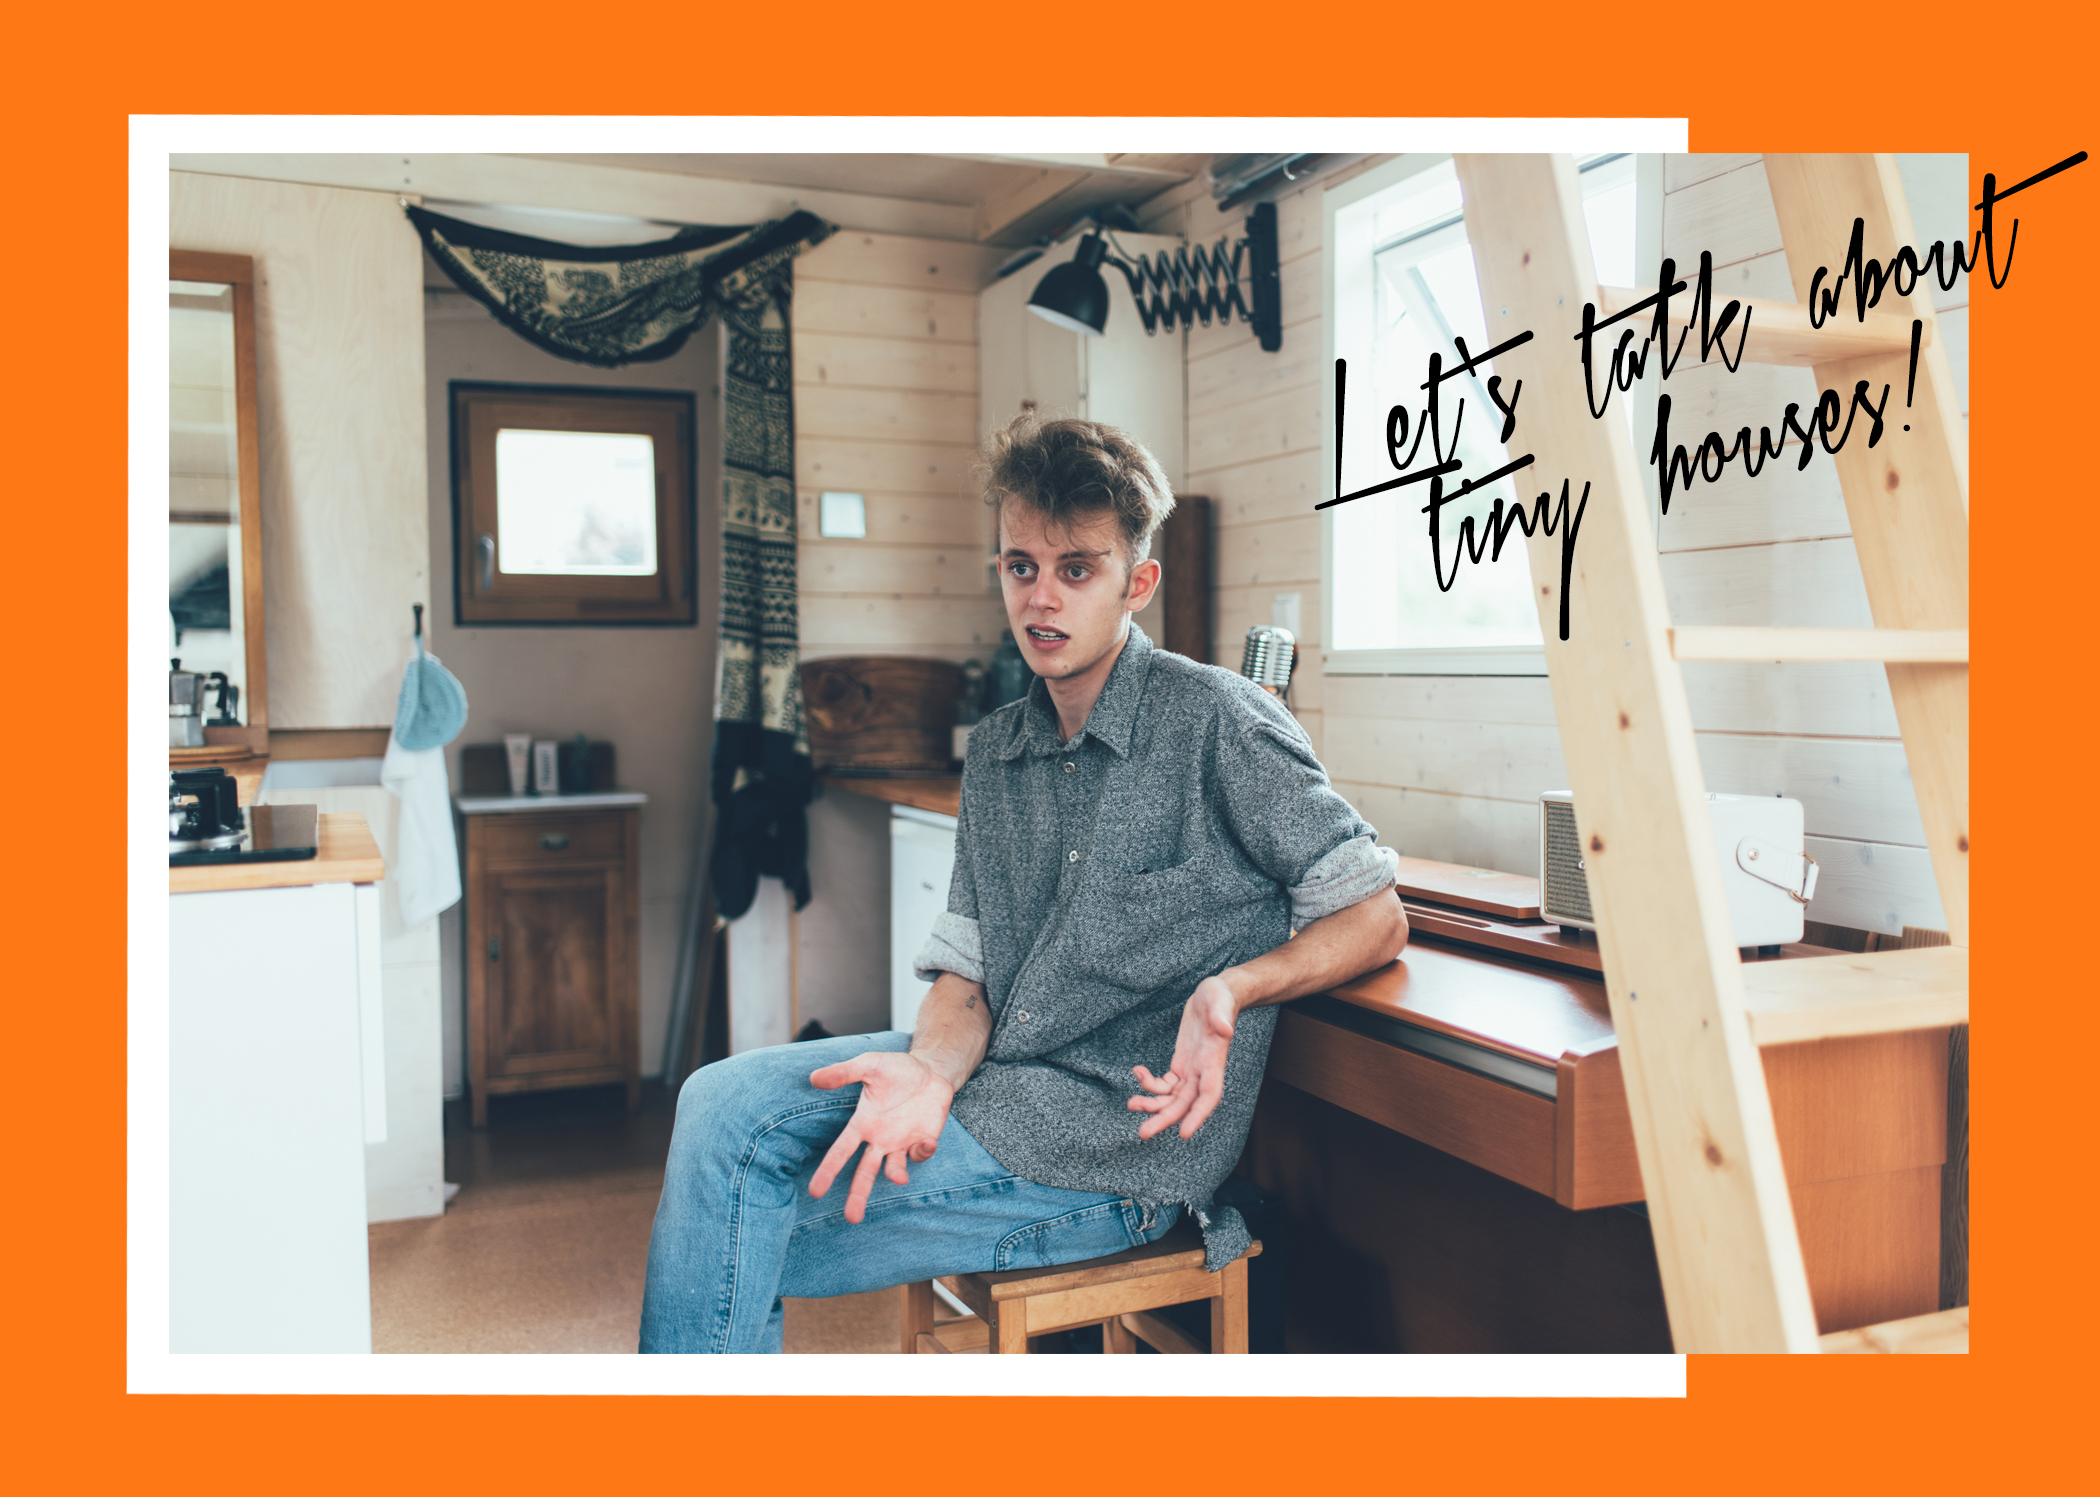 Tinyhouse-wanderlust-x03